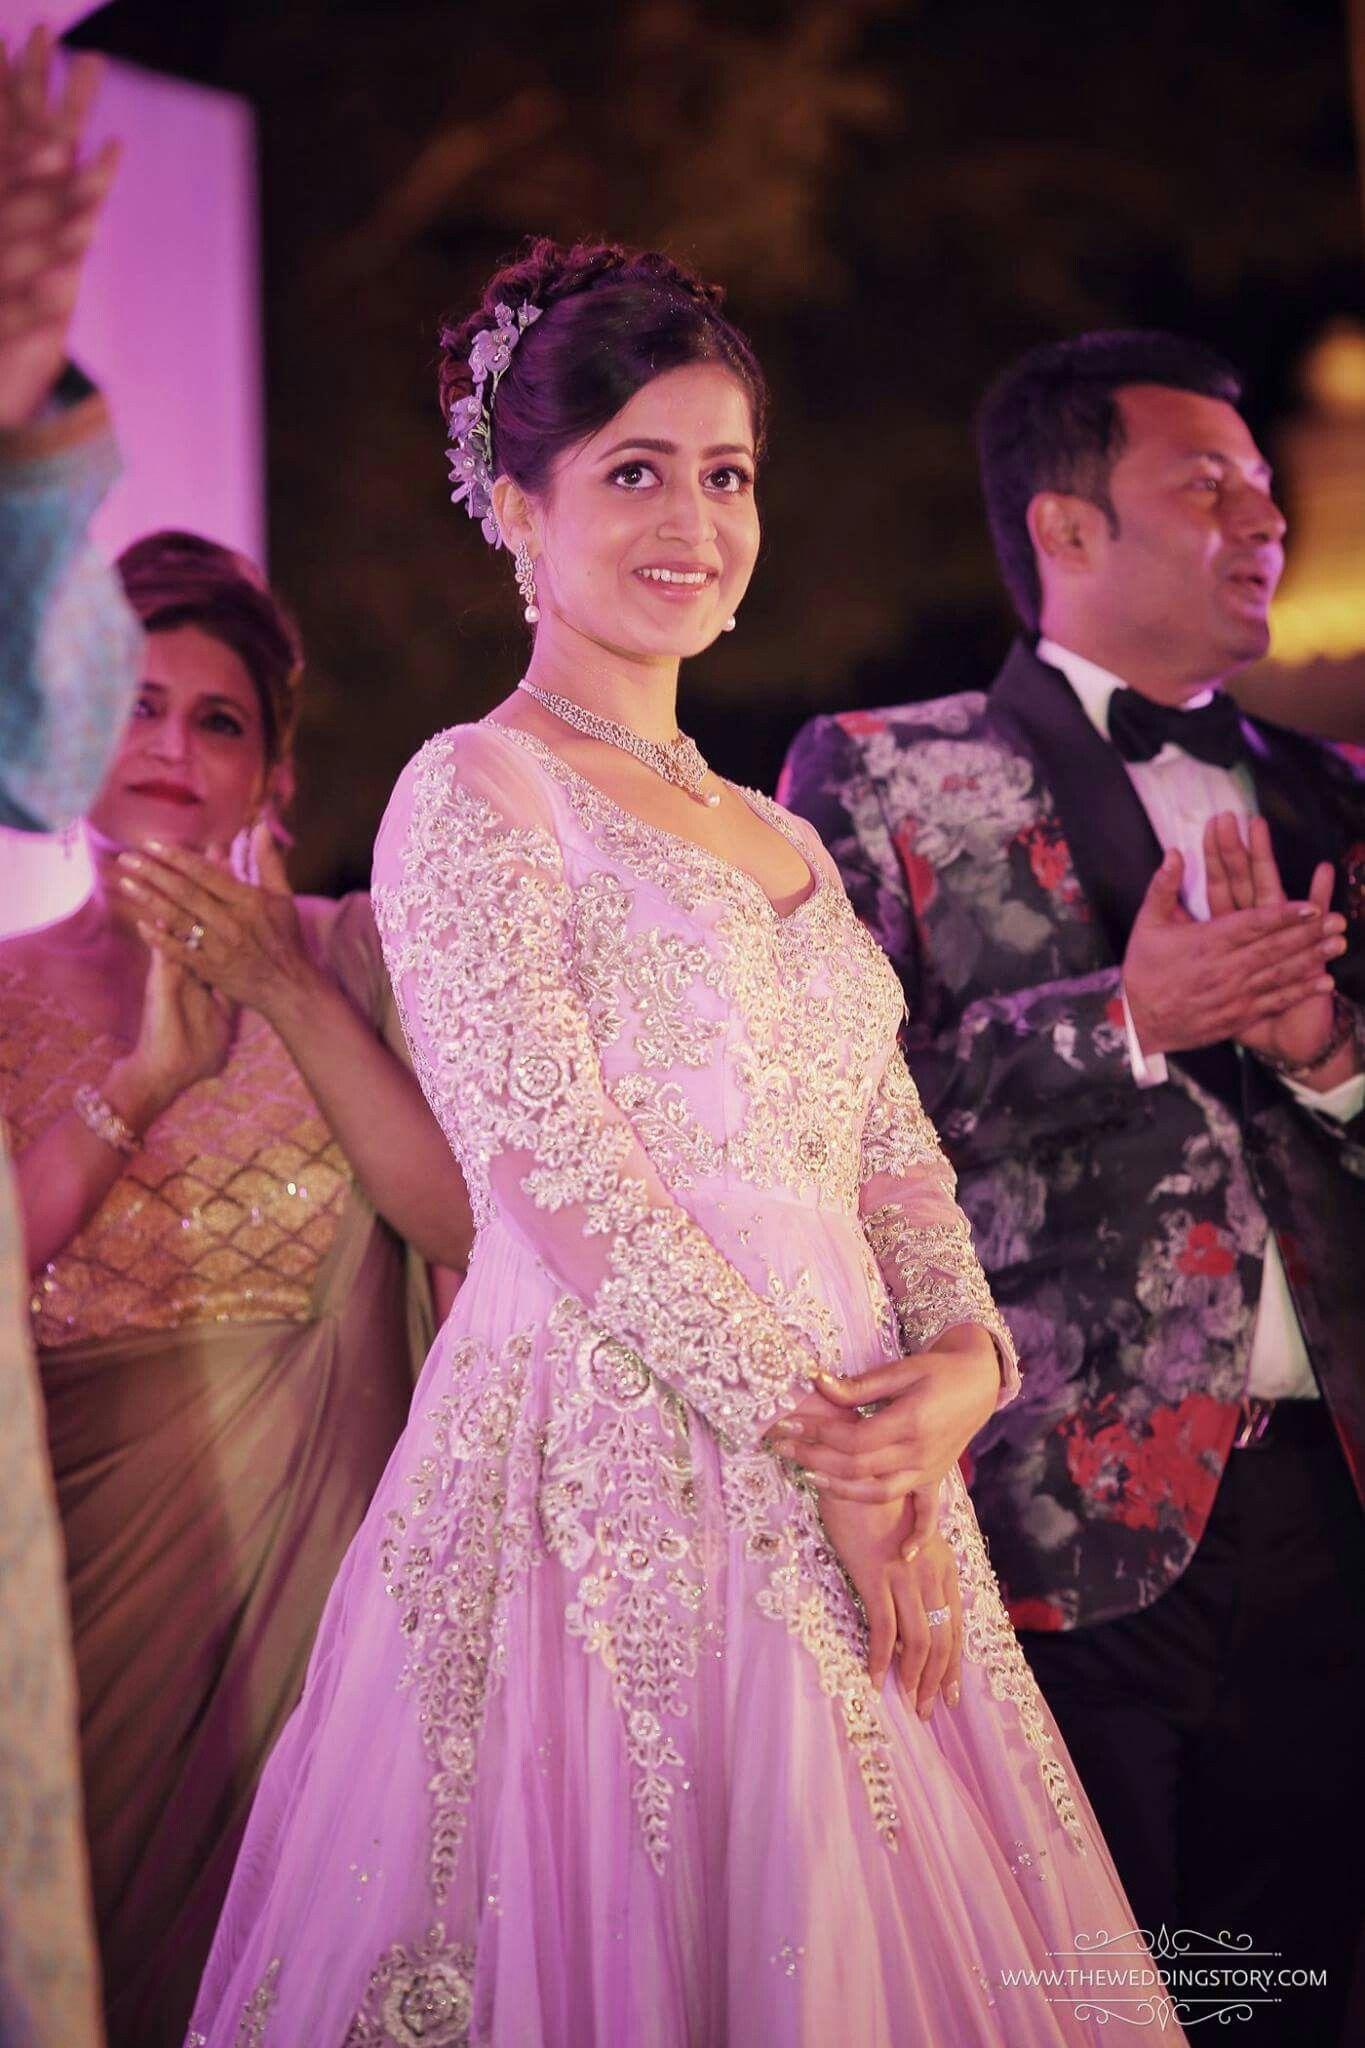 Pin de Akanksha Parihar en Outfit | Pinterest